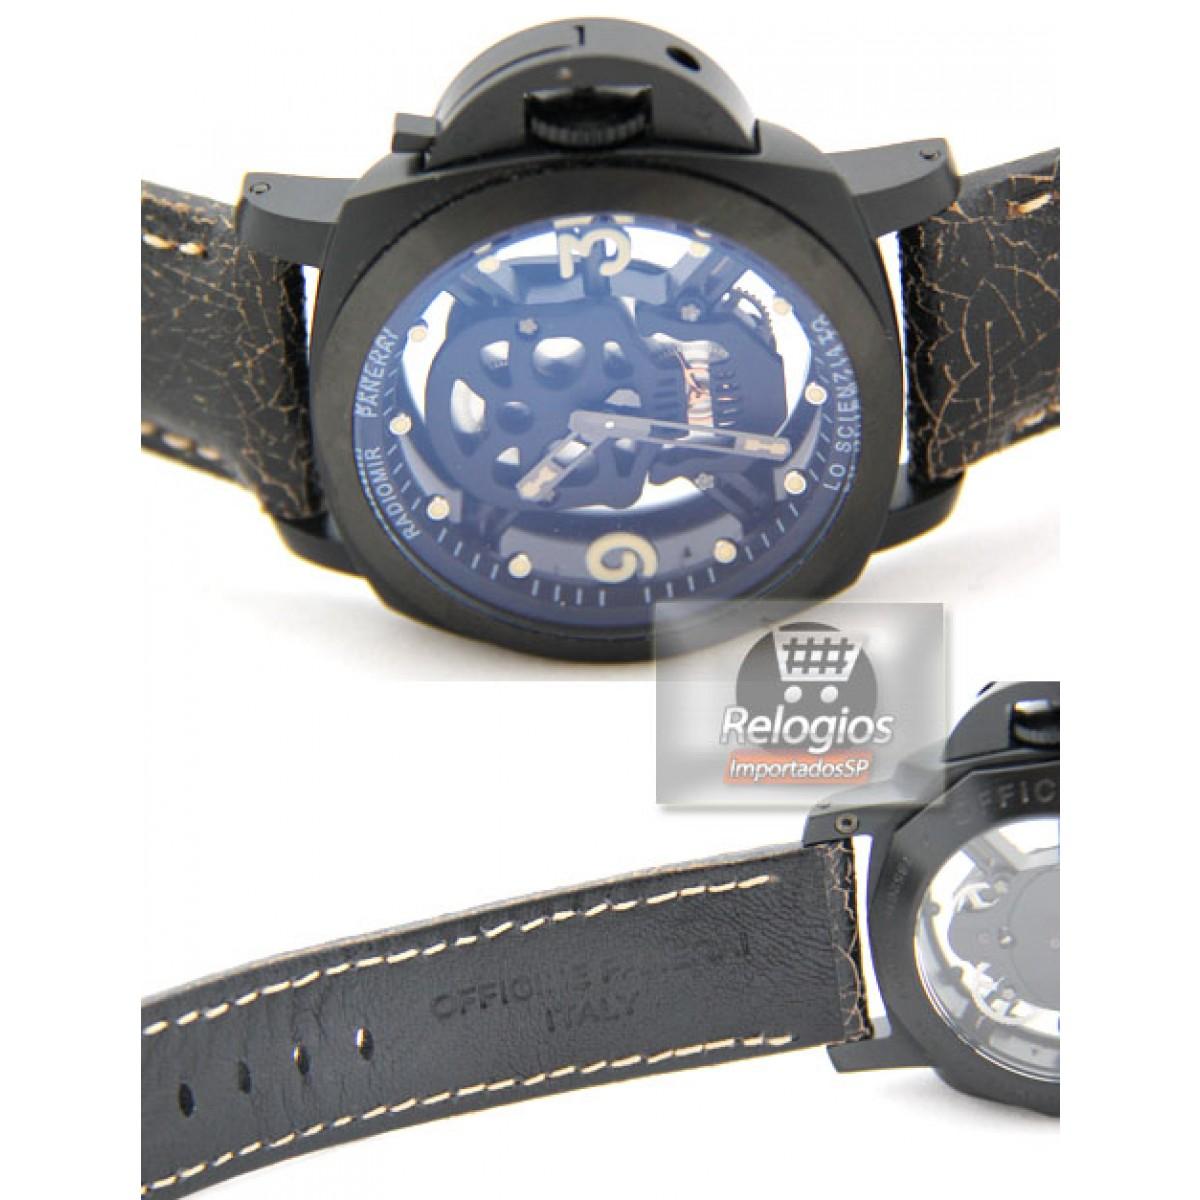 ba65f047e7f Relógio Réplica Panerai Radiomir Caveira Limited Black